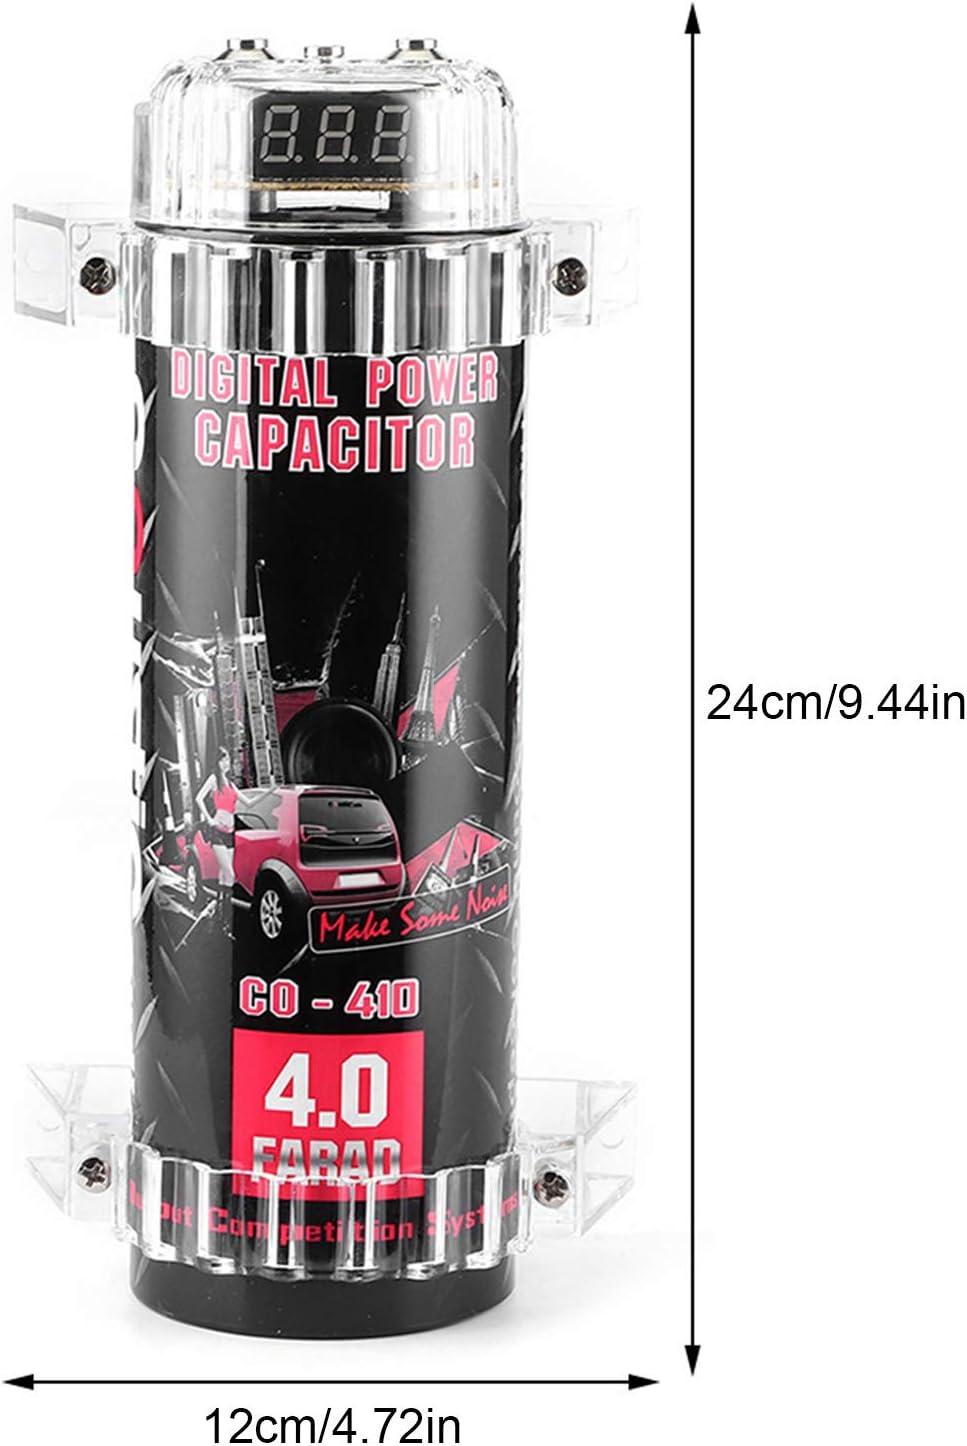 Kimiss Digitalkondensator 4 Farad Power Kondensator Led Spannungsanzeige Power Cap Car Audio Verstärker Auto